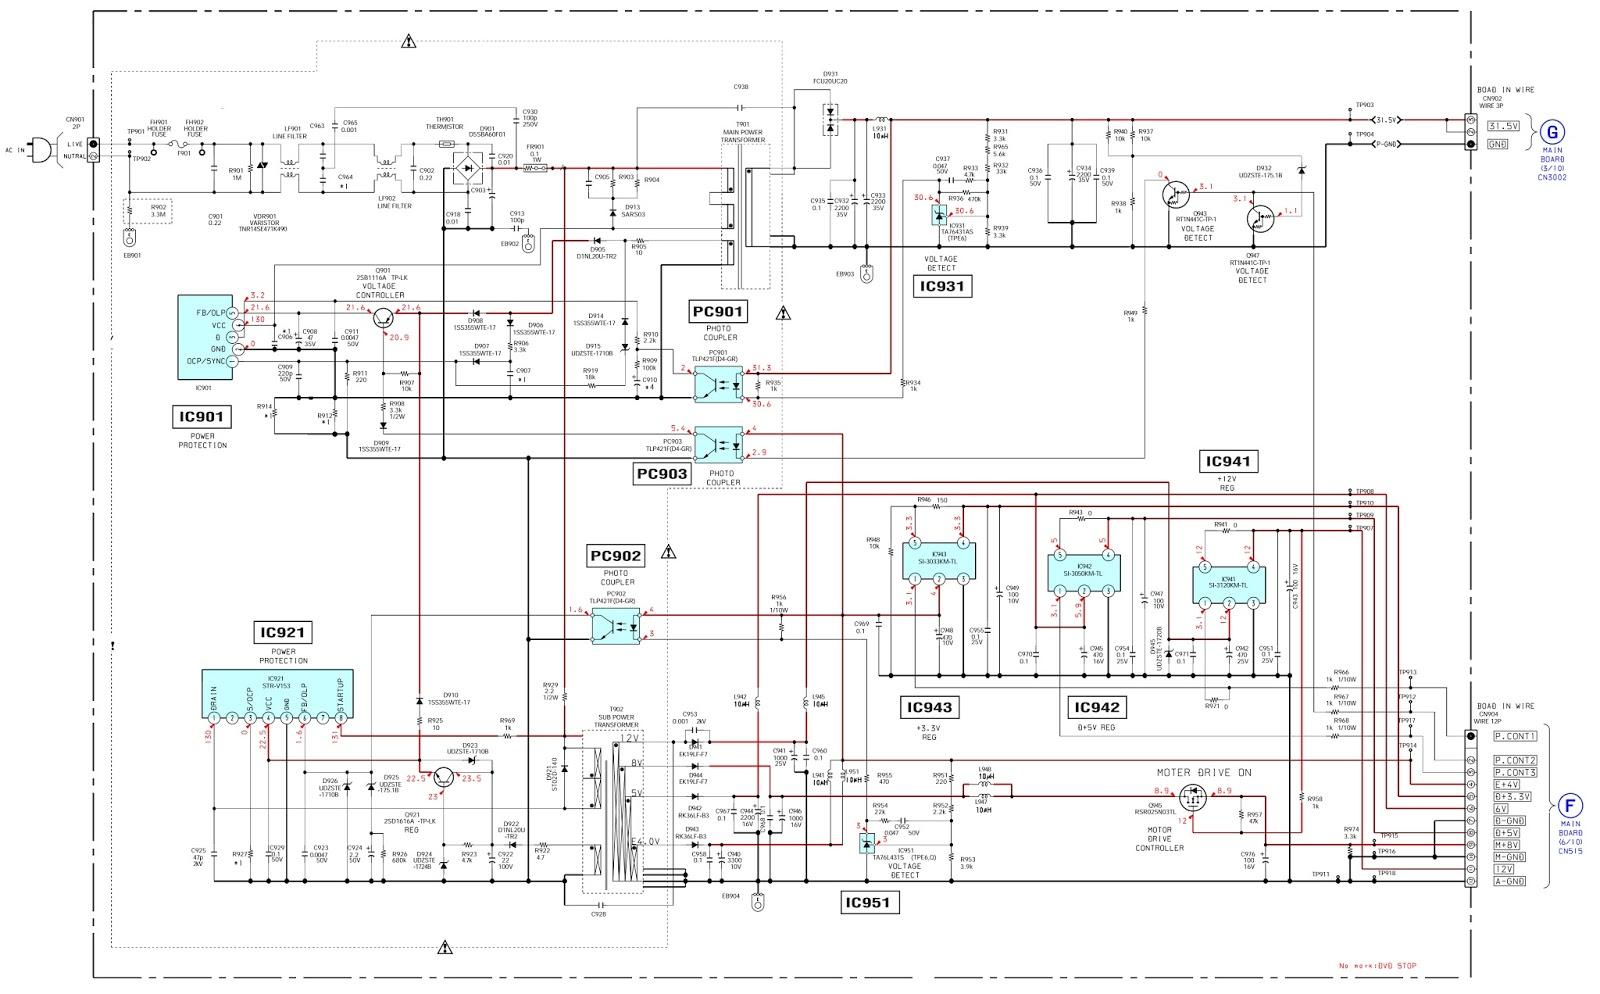 SONY Home Theater System - DAV DZ120K - POWER SUPPLY -SCHEMATIC ...